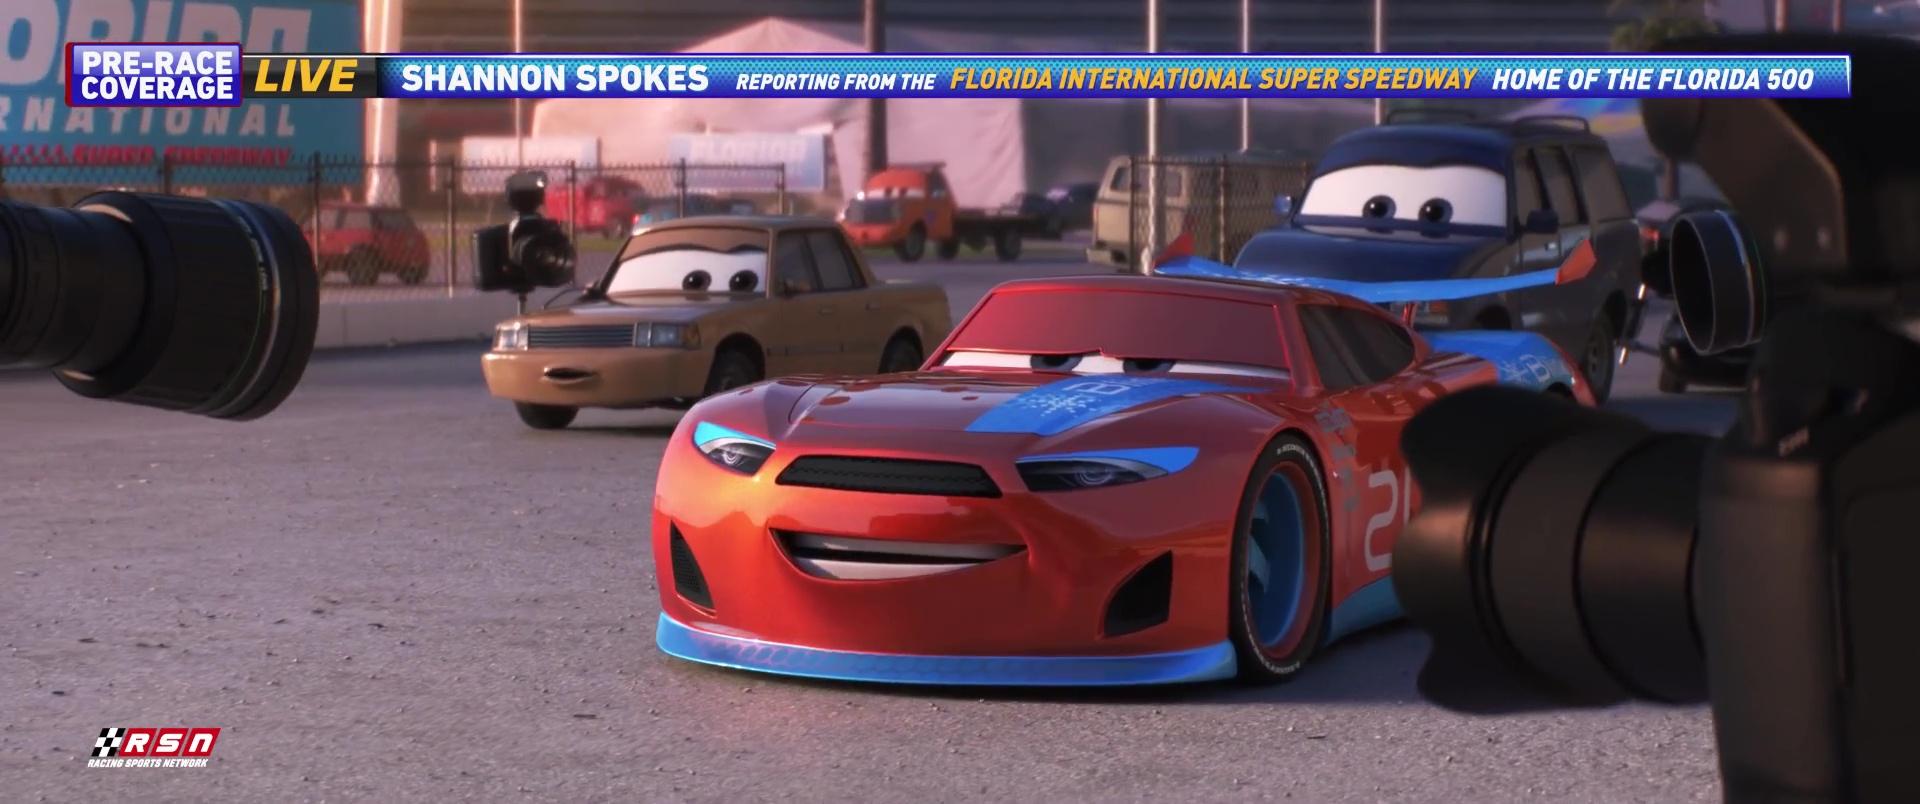 ryan-laney-personnage-cars-3-01